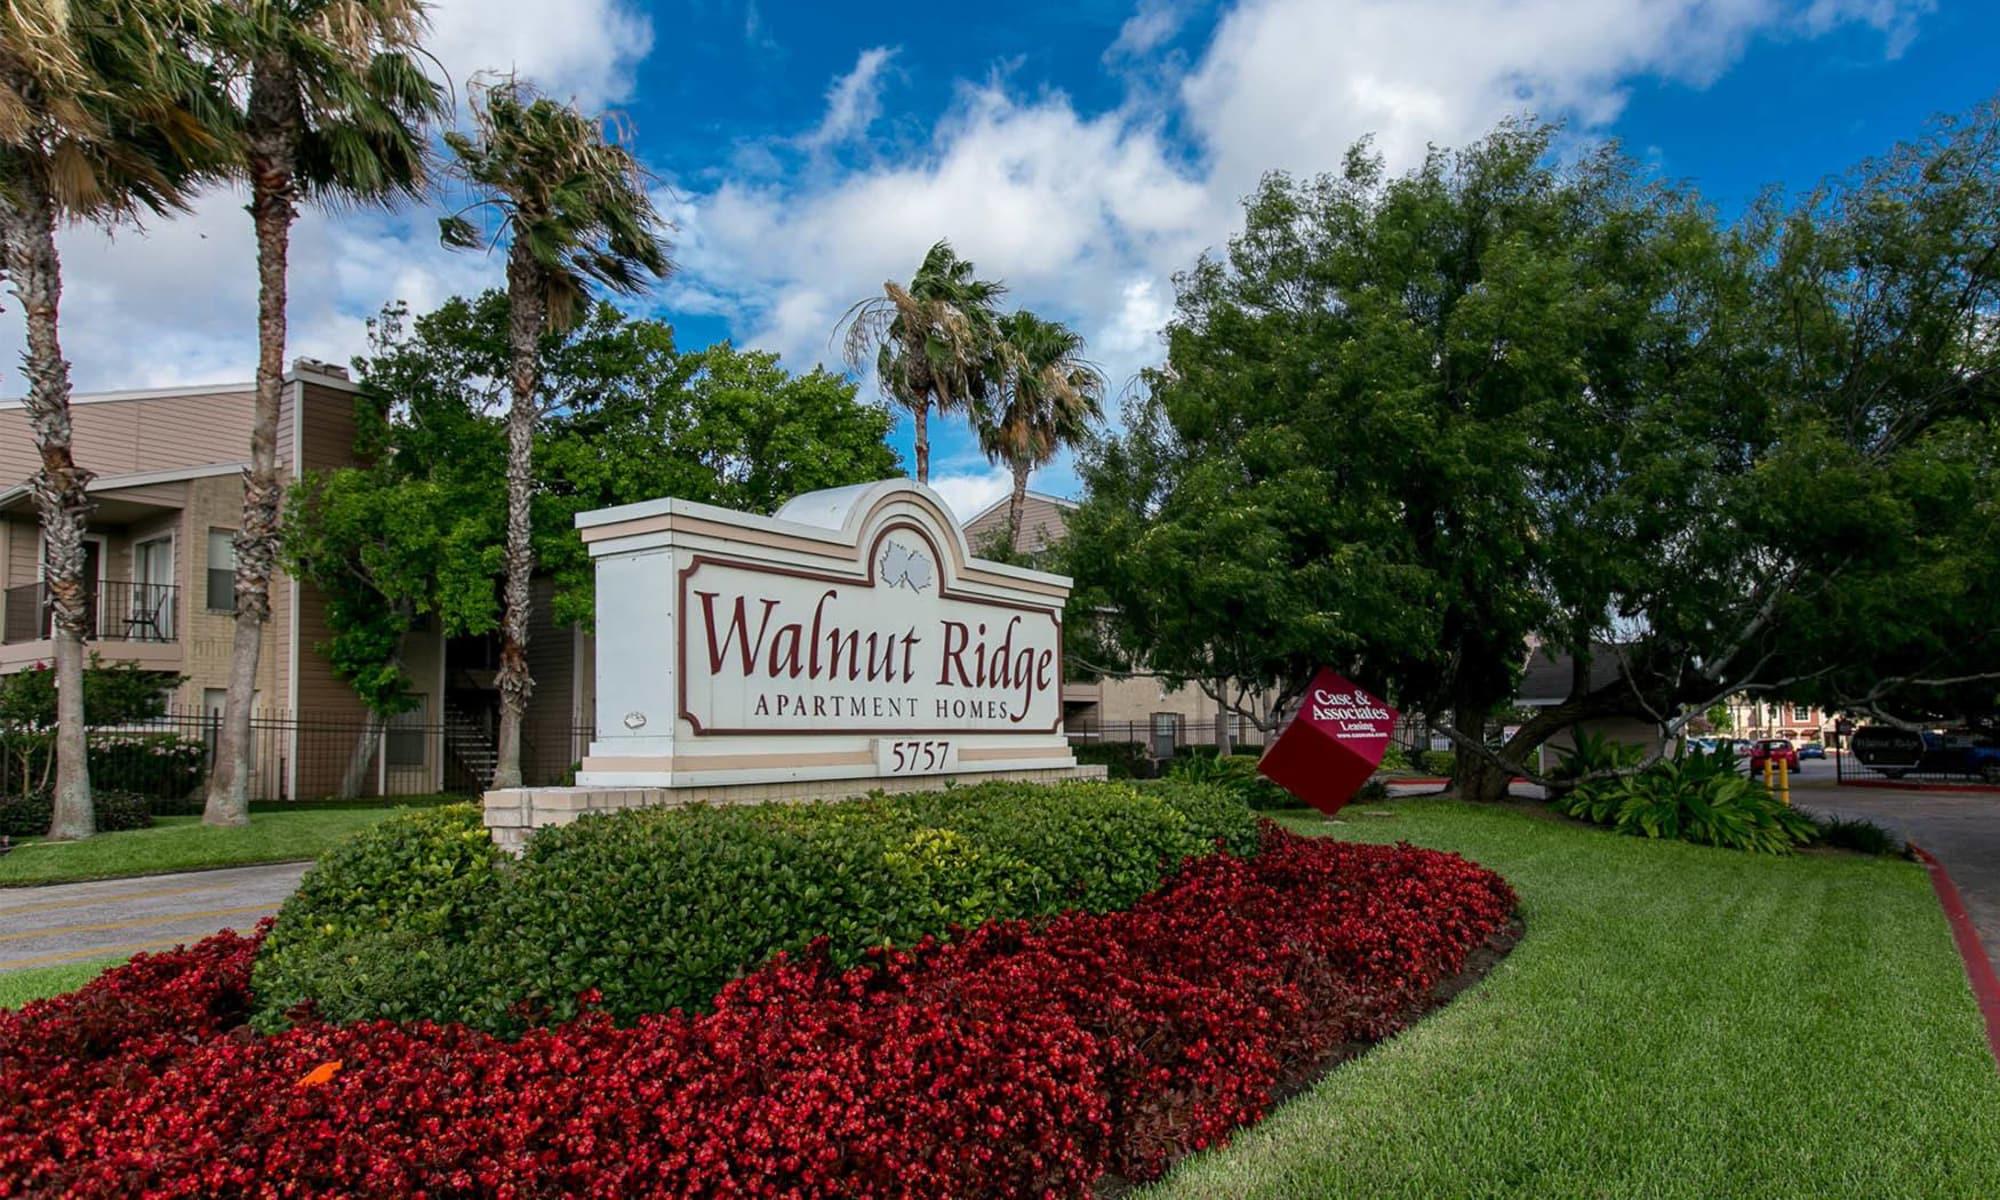 Walnut Ridge Apartments in Corpus Christi, Texas